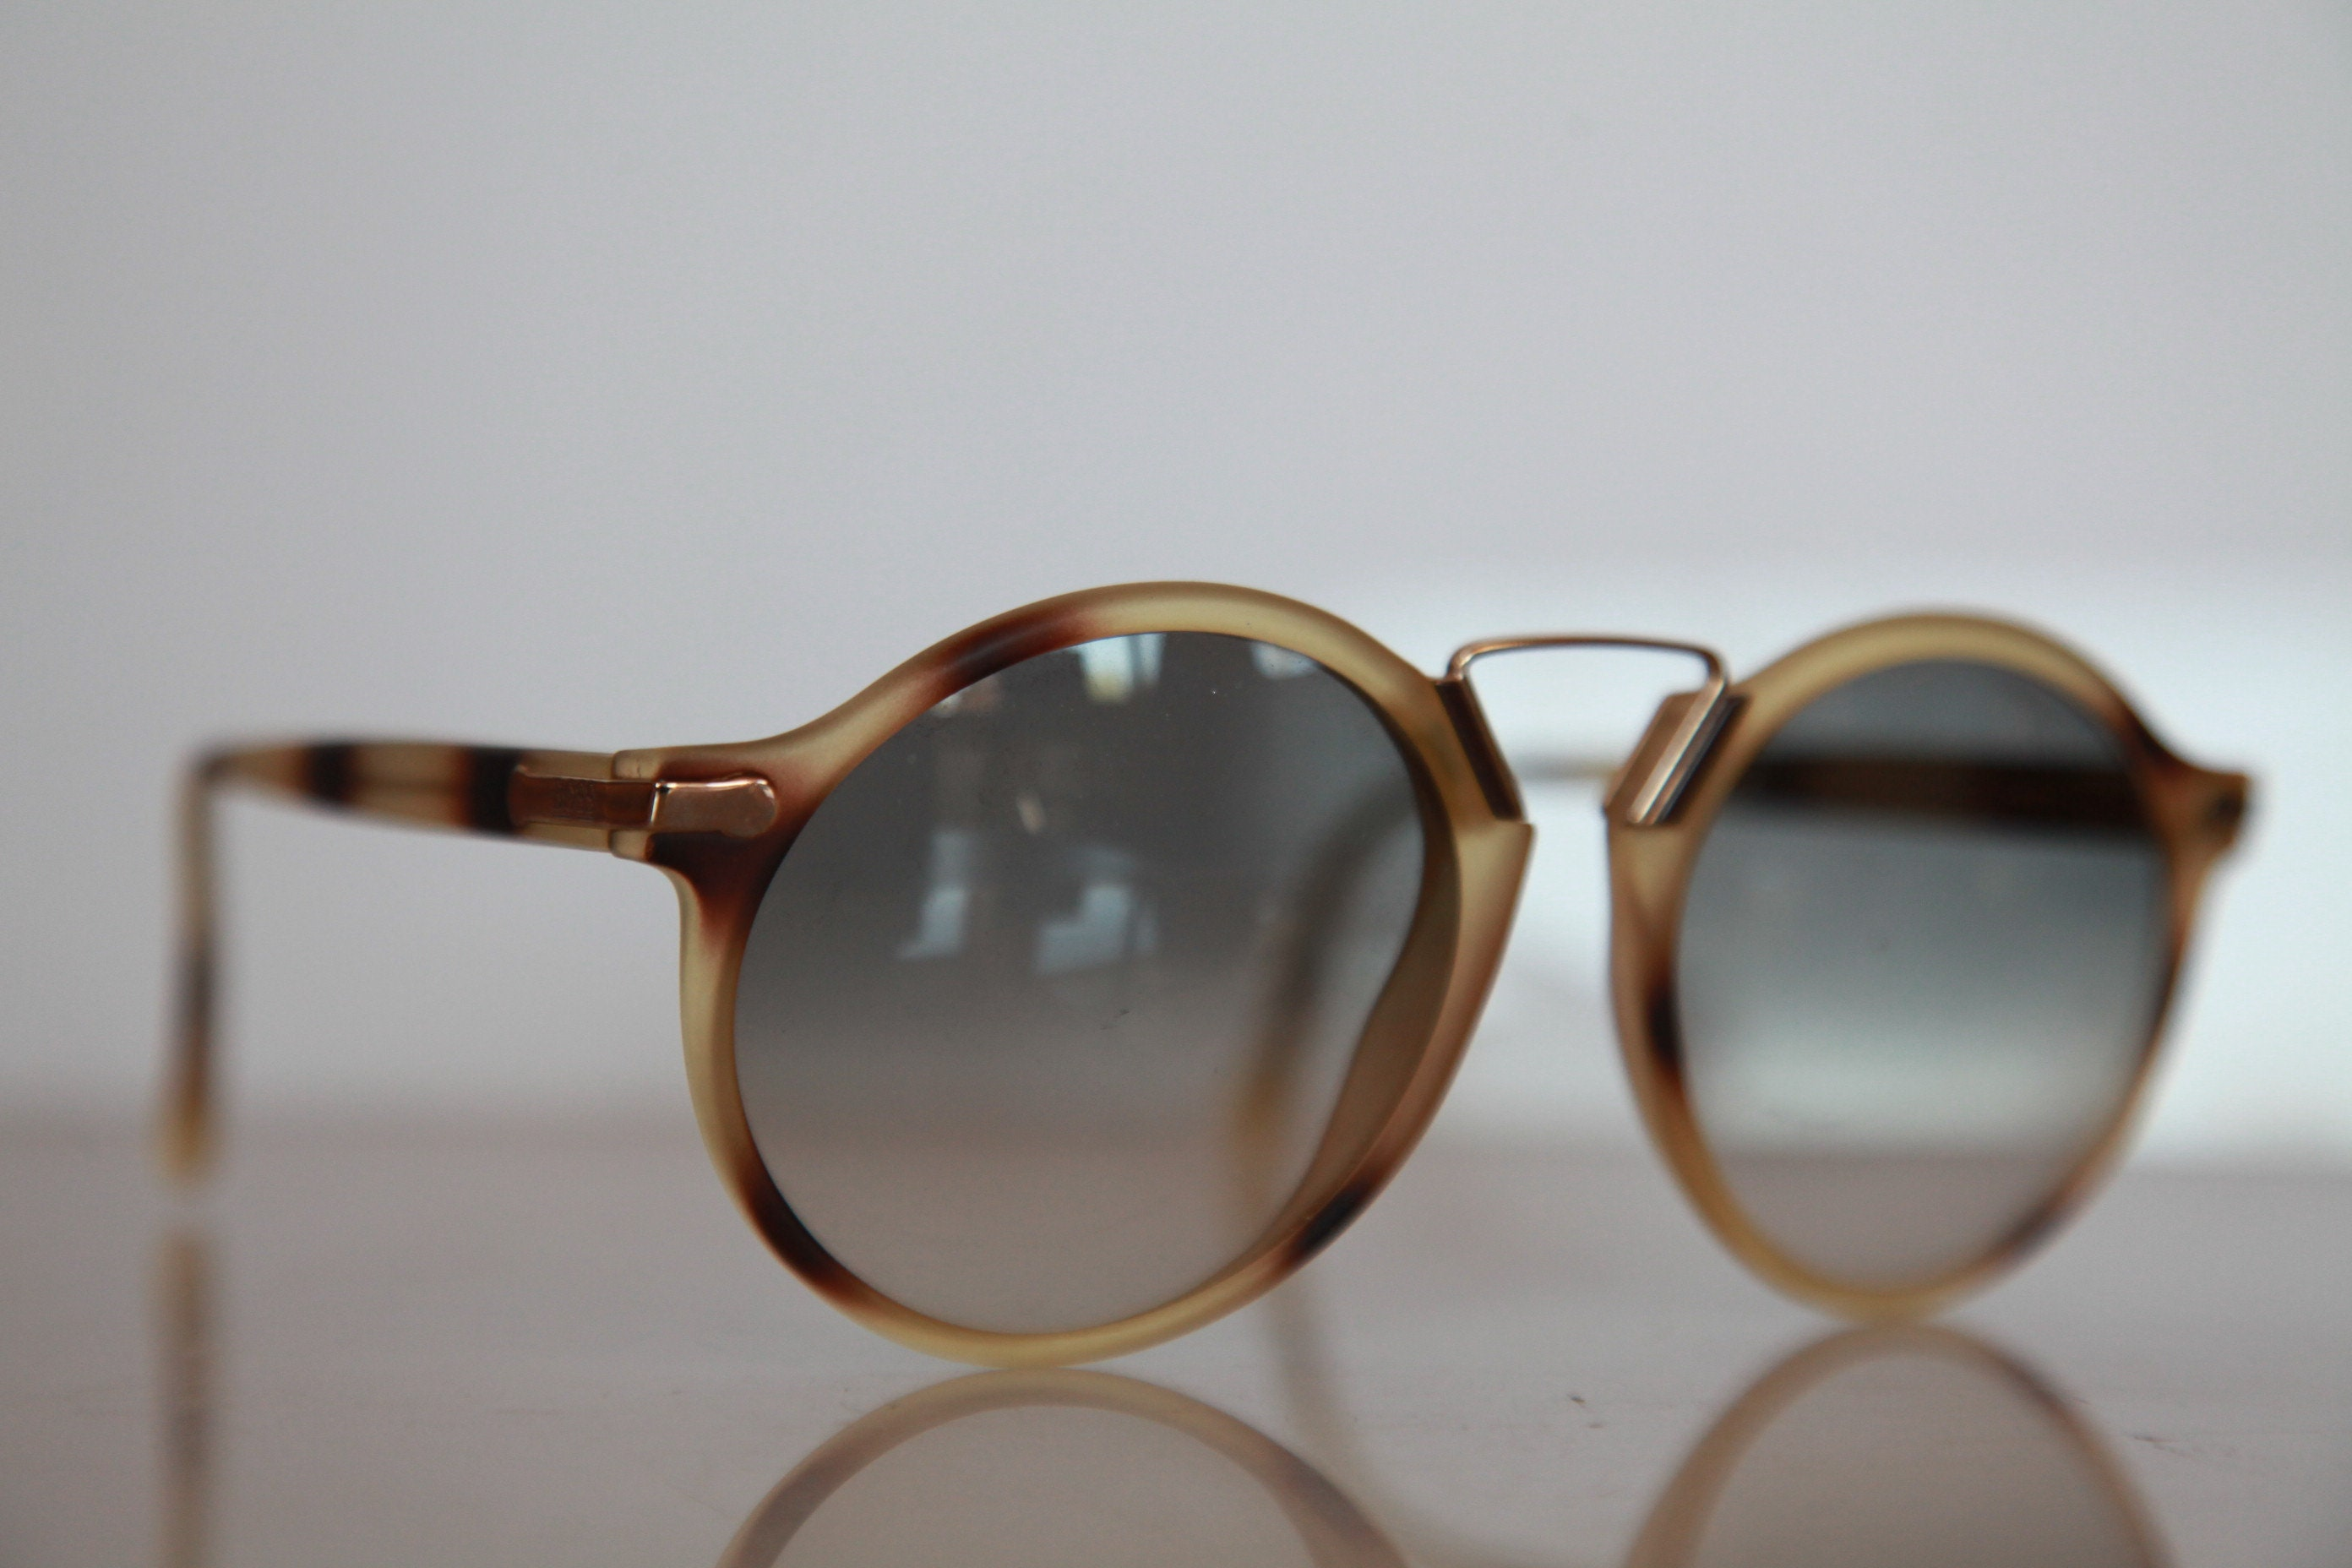 e844633acc4d3 Vintage HUGO BOSS CARRERA 5151 Sunglasses